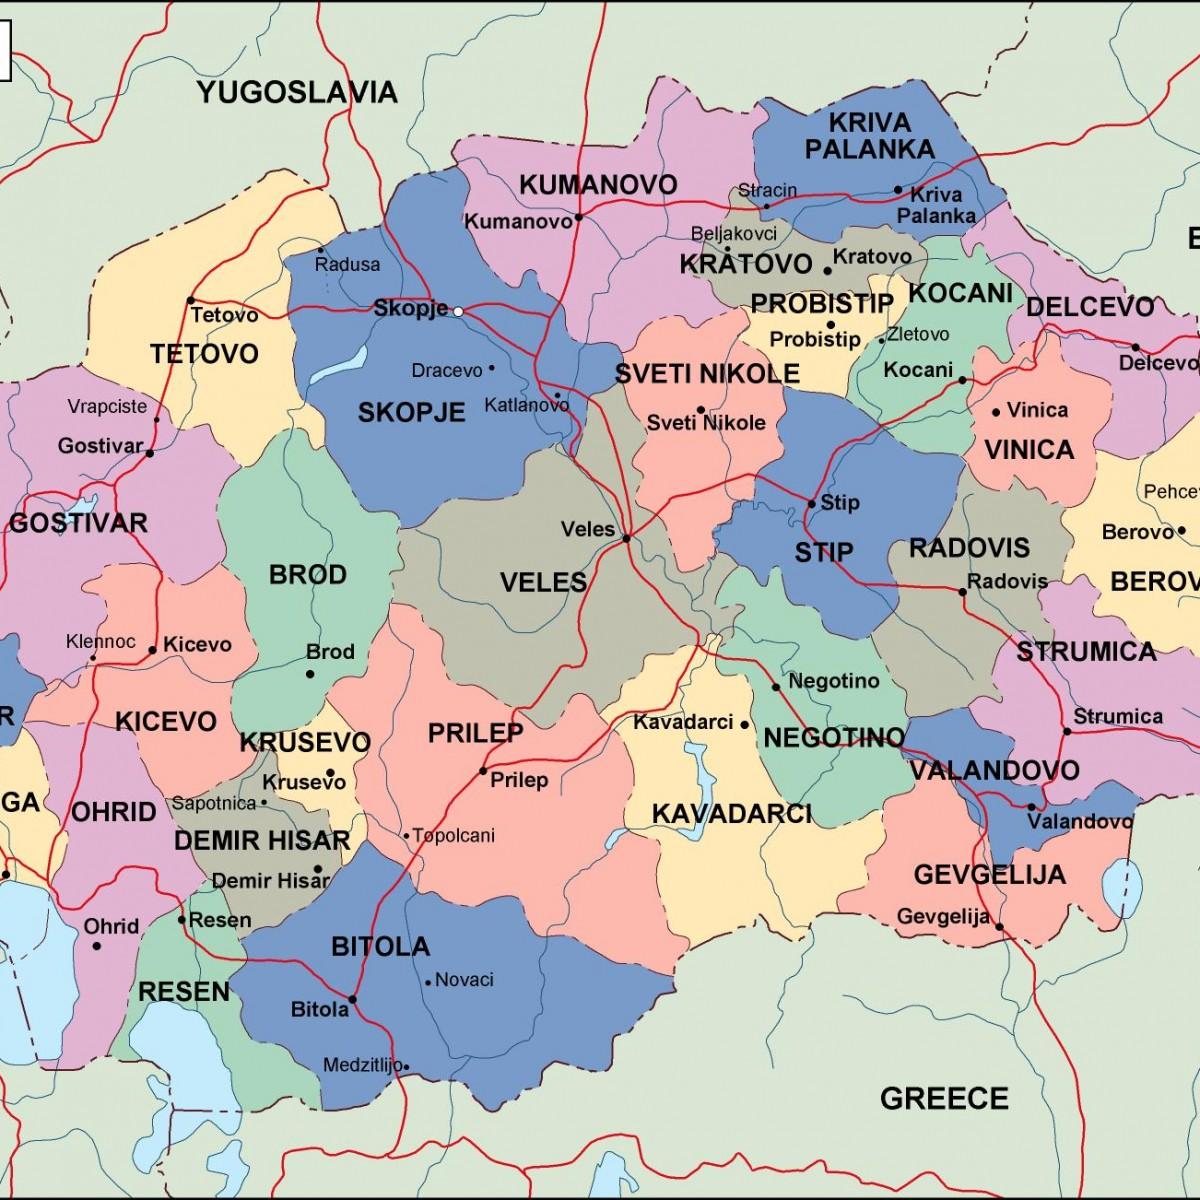 macedonia political map Illustrator Vector Eps maps Eps